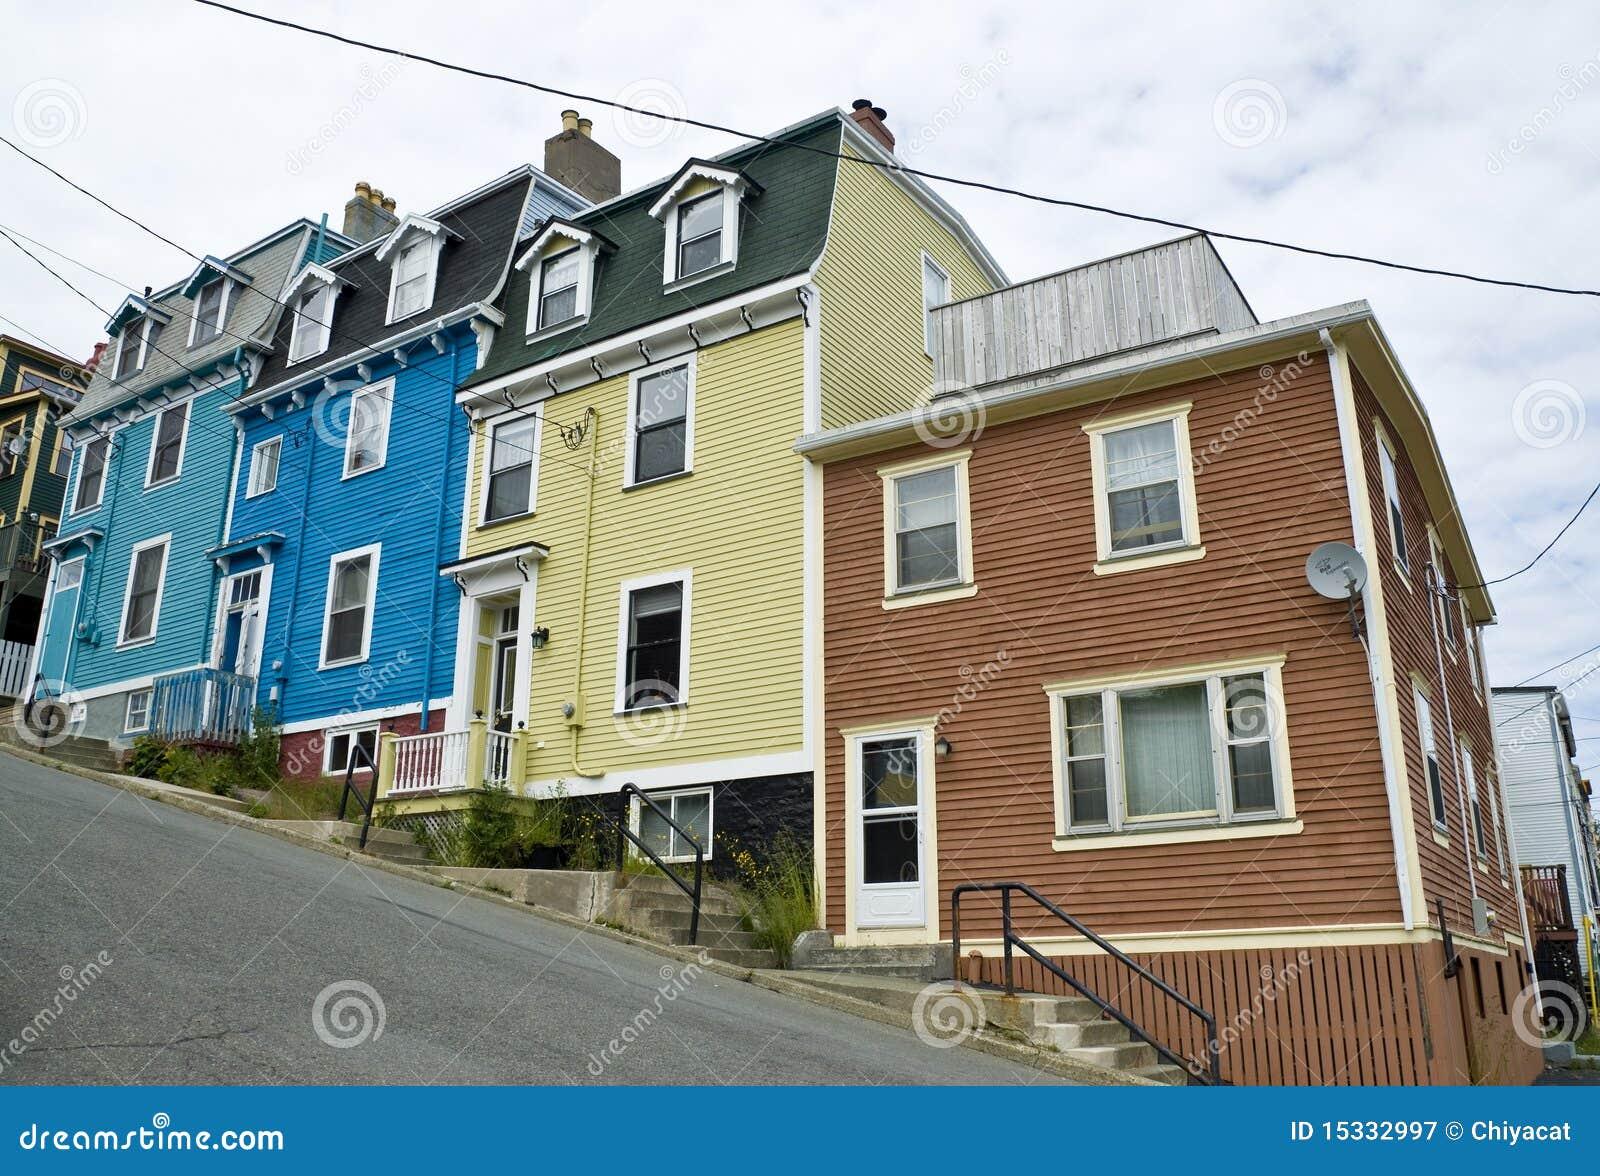 Jelly bean row houses st john 39 s stock image image for Newfoundland houses